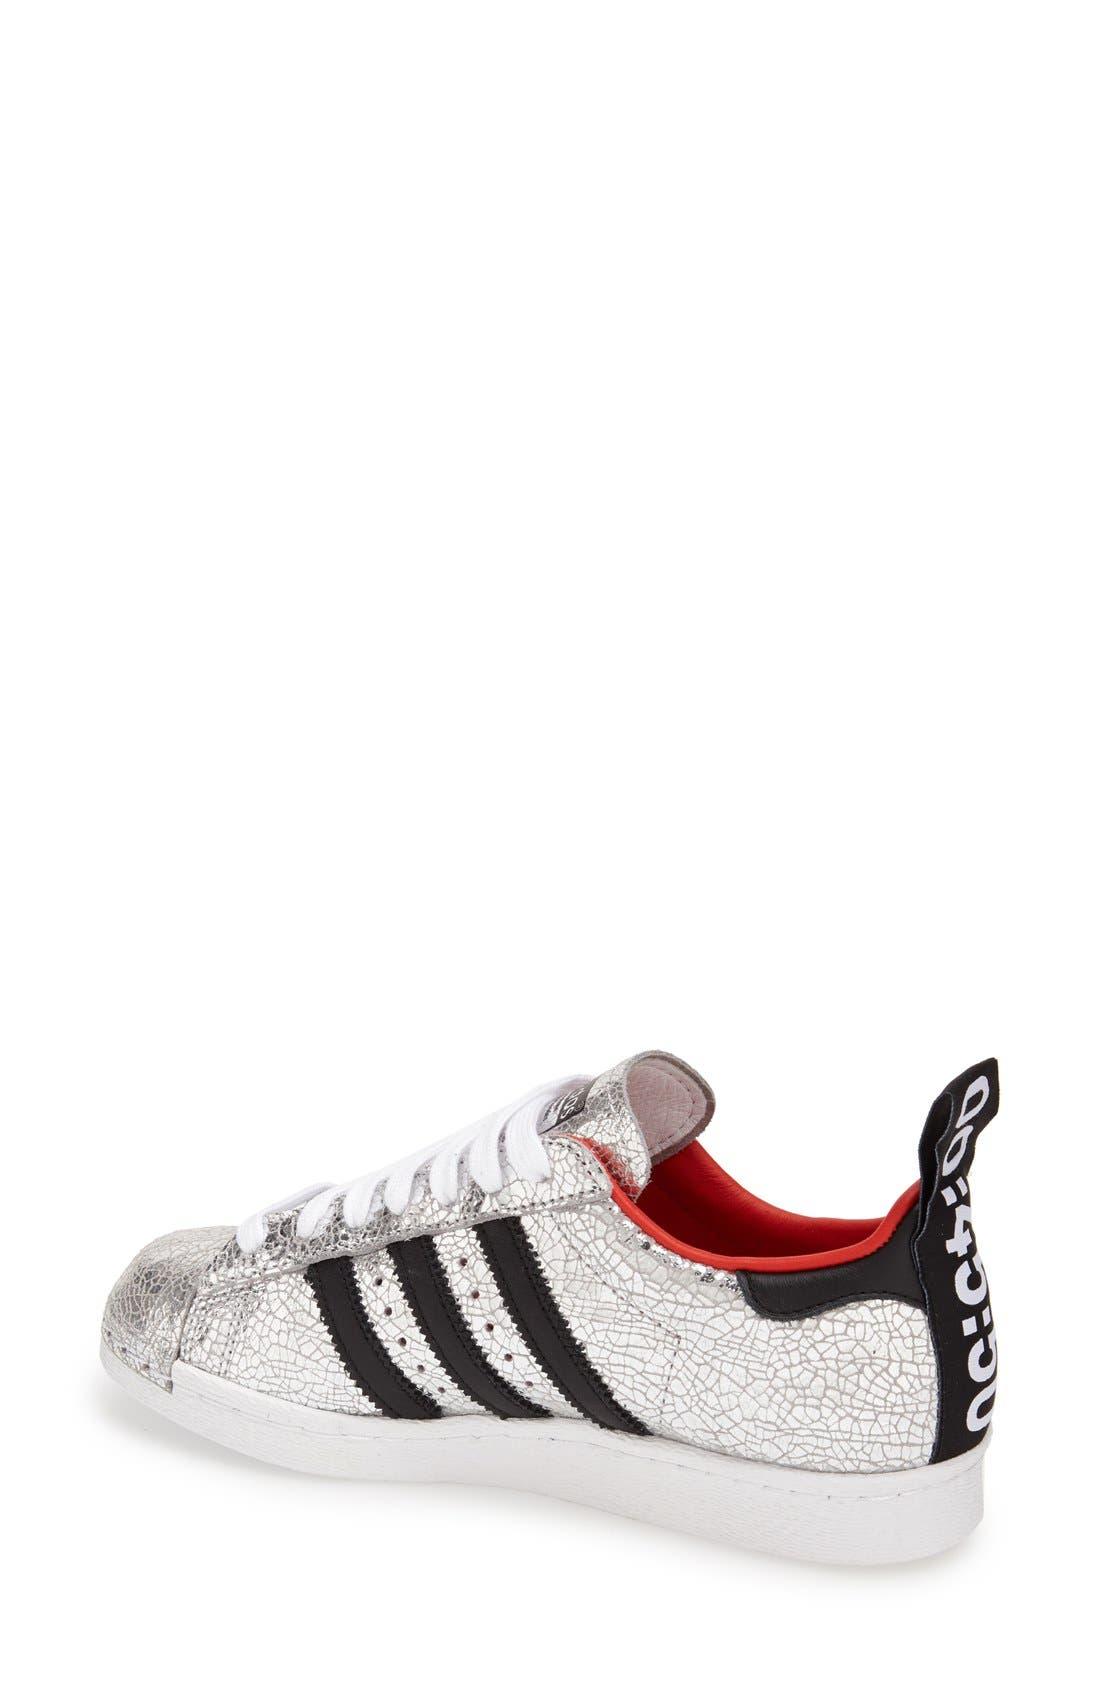 Alternate Image 2  - Topshop for adidas Originals '80s Premium Superstar' Sneaker (Women)